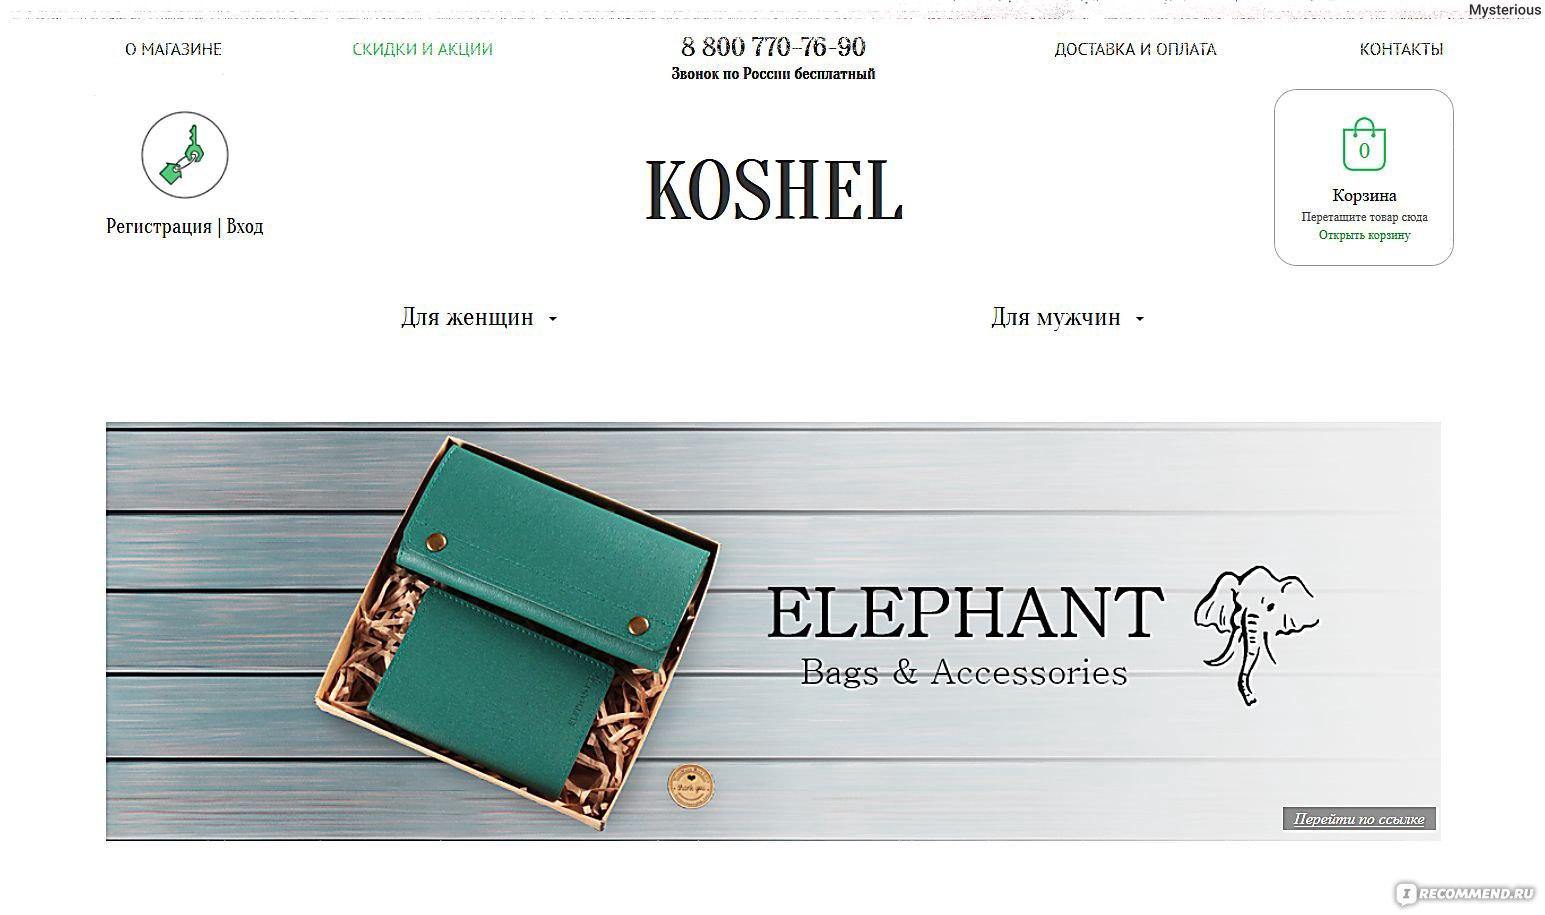 91fc6232dffc Сайт Интернет-магазин Koshel-shop.ru - «Интернет-магазин «KOSHEL ...